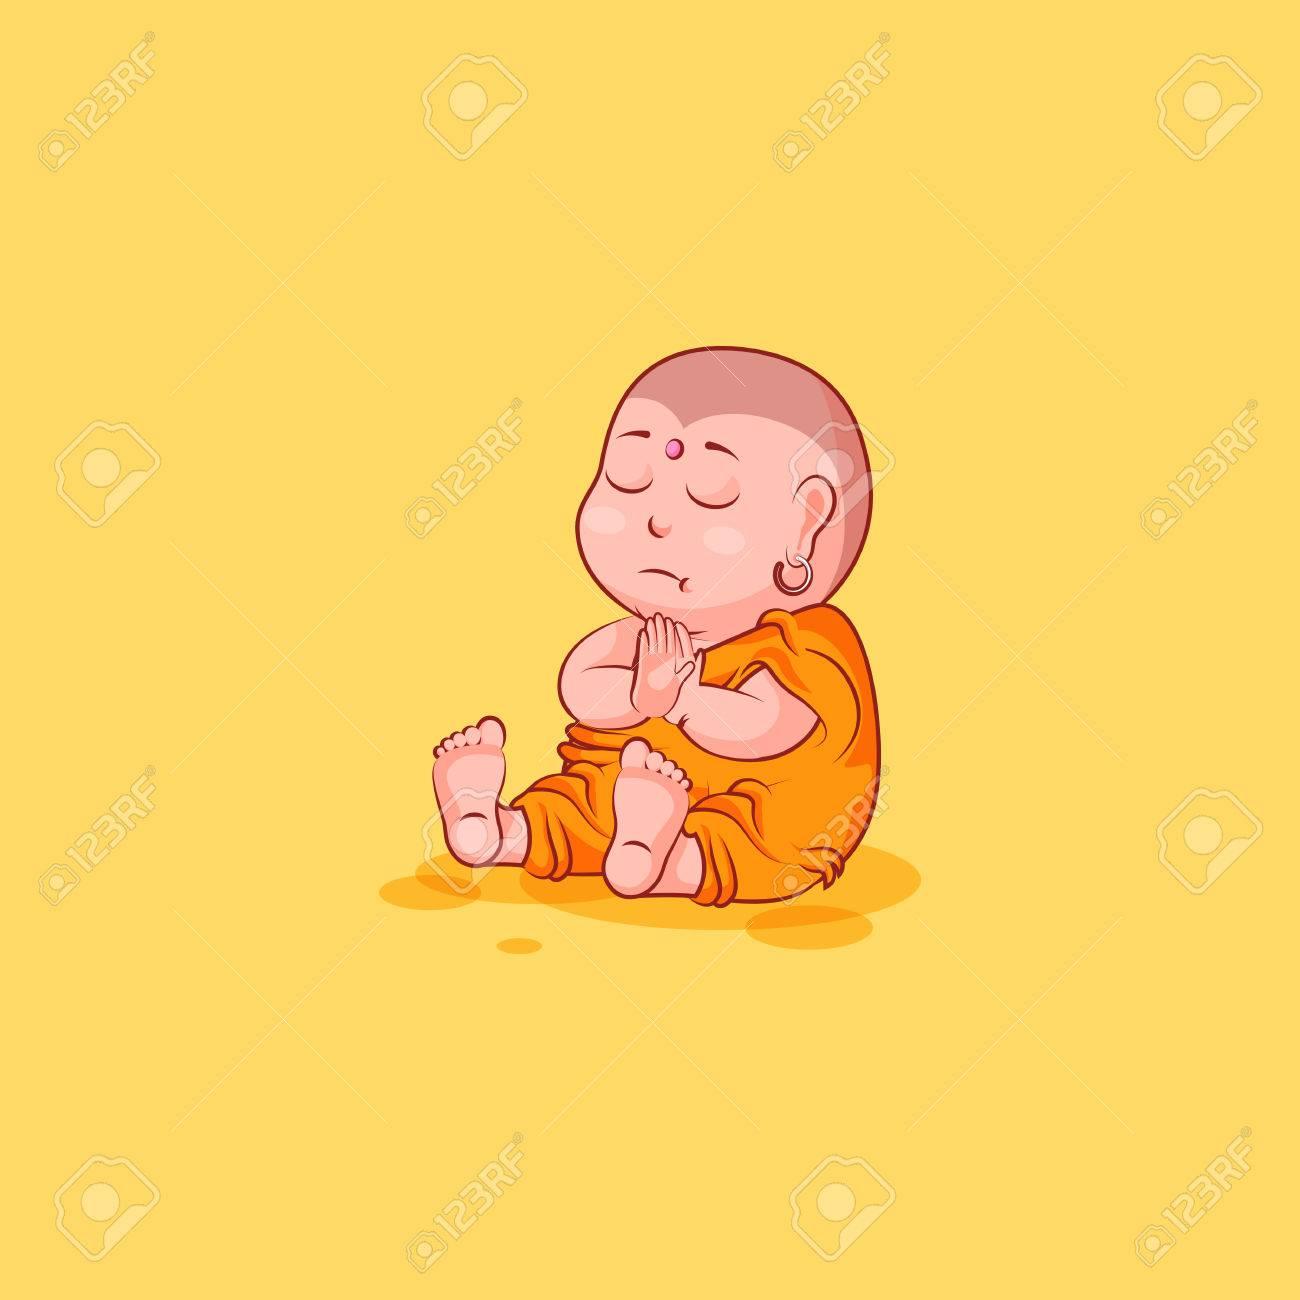 Sticker emoji emoticon emotion vector isolated illustration sticker emoji emoticon emotion vector isolated illustration unhappy character cartoon meditate buddha stock vector 77924650 biocorpaavc Image collections